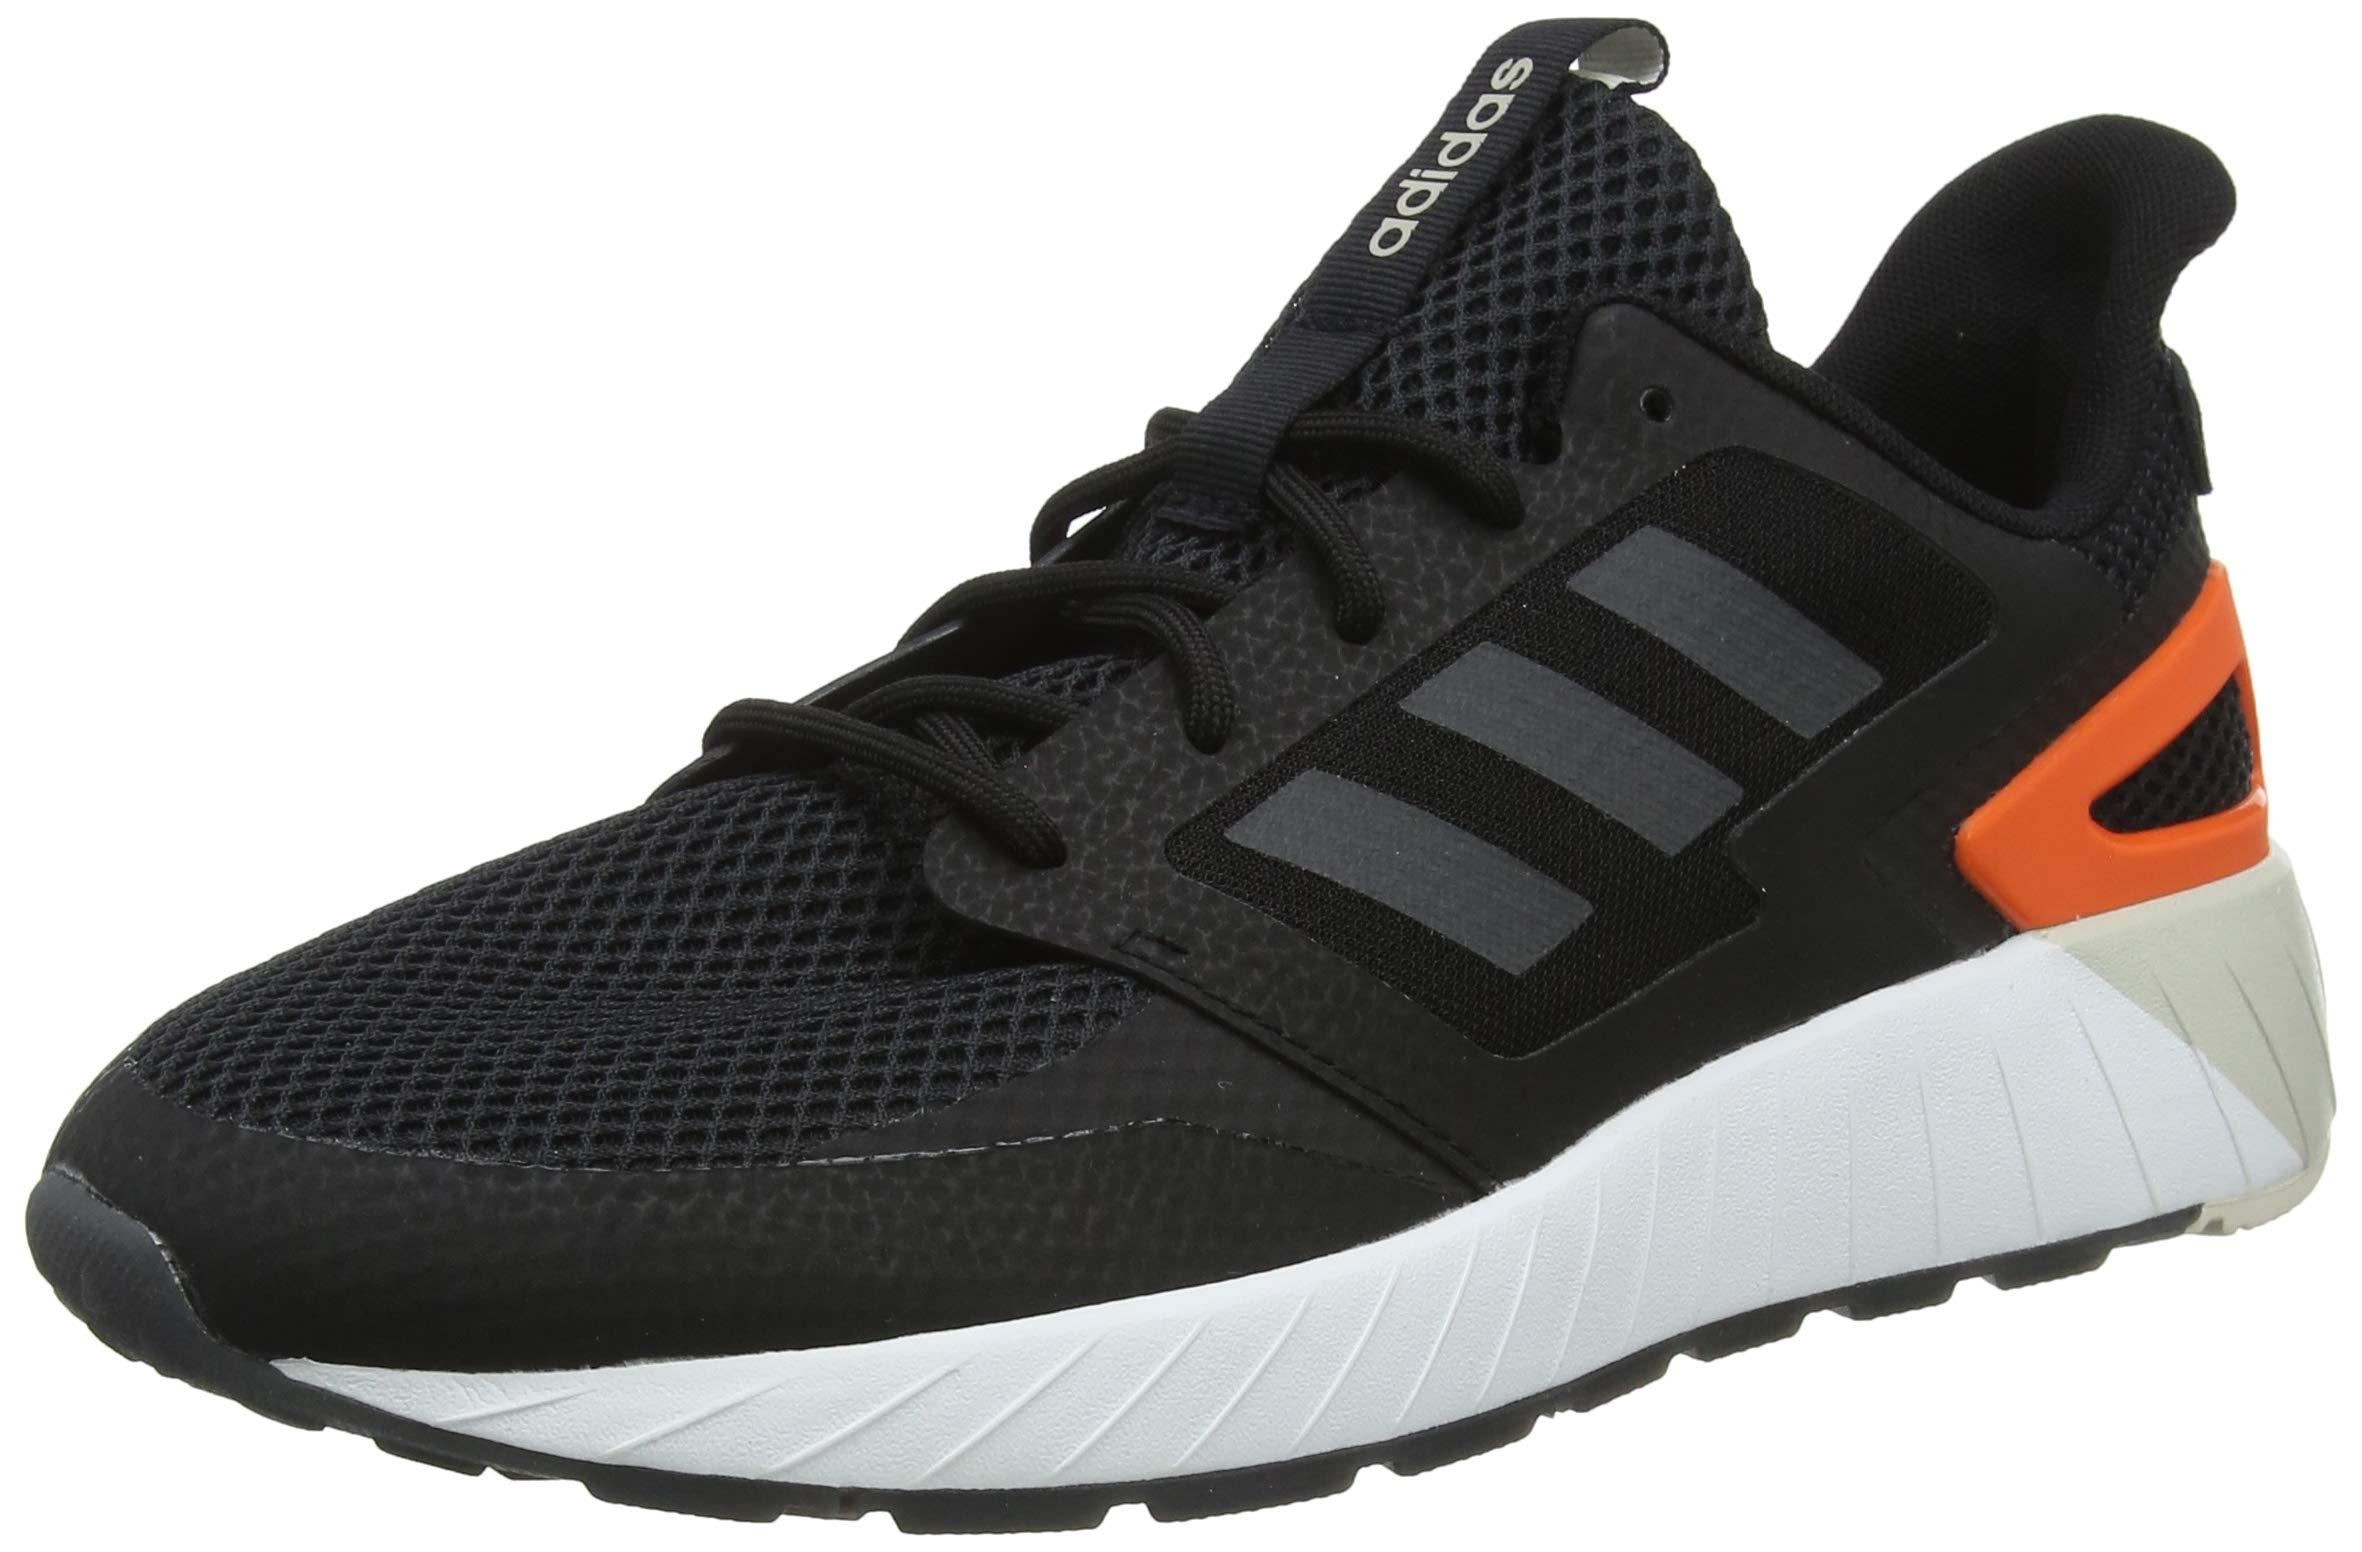 raw Adidas QuestarstrikeBaskets HommeNoircore White Black grey Six Eu 042 zMjqpSGLUV